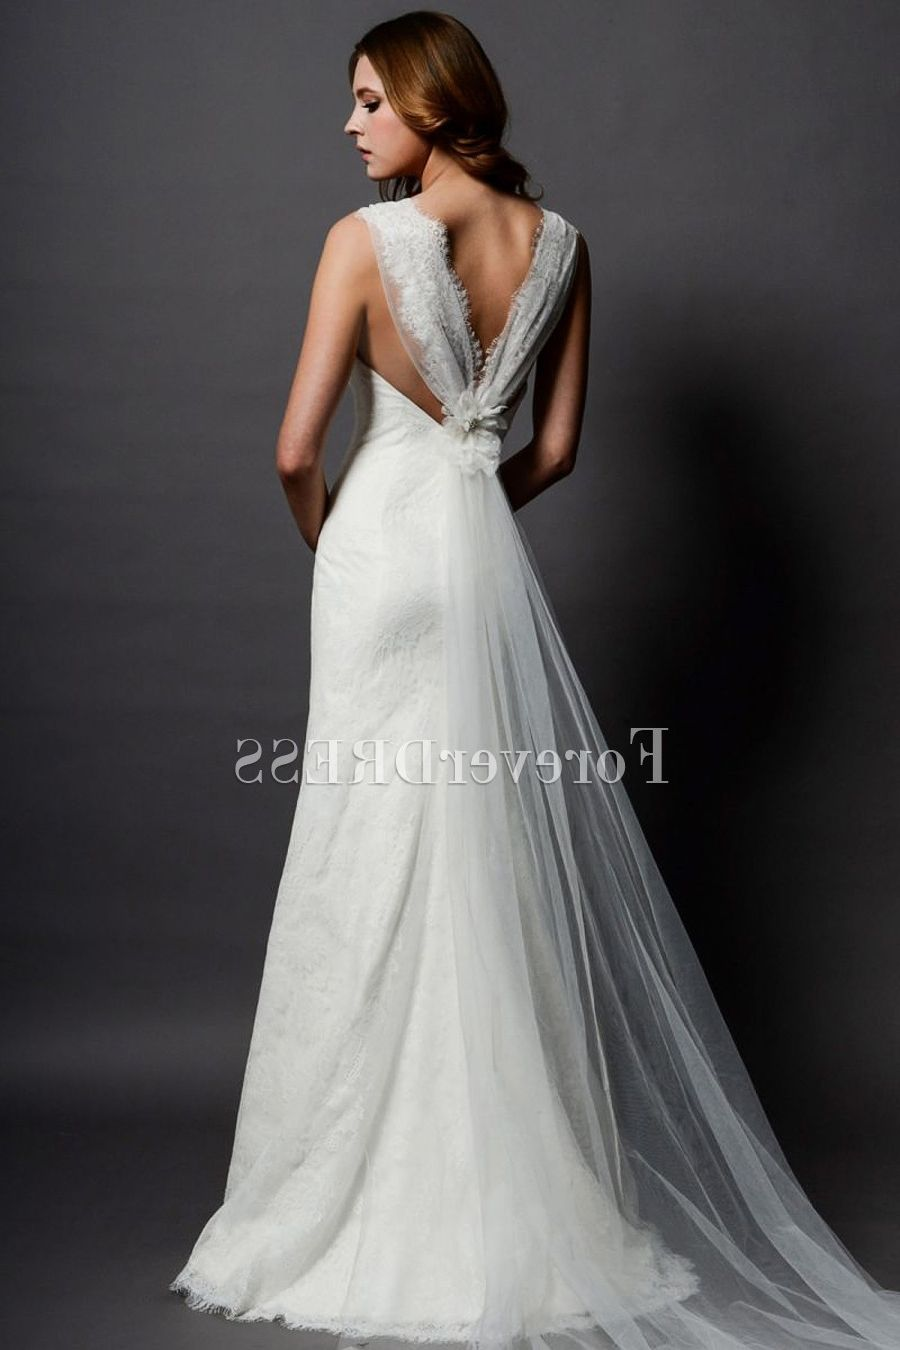 Wedding dresses for short hourglass figures